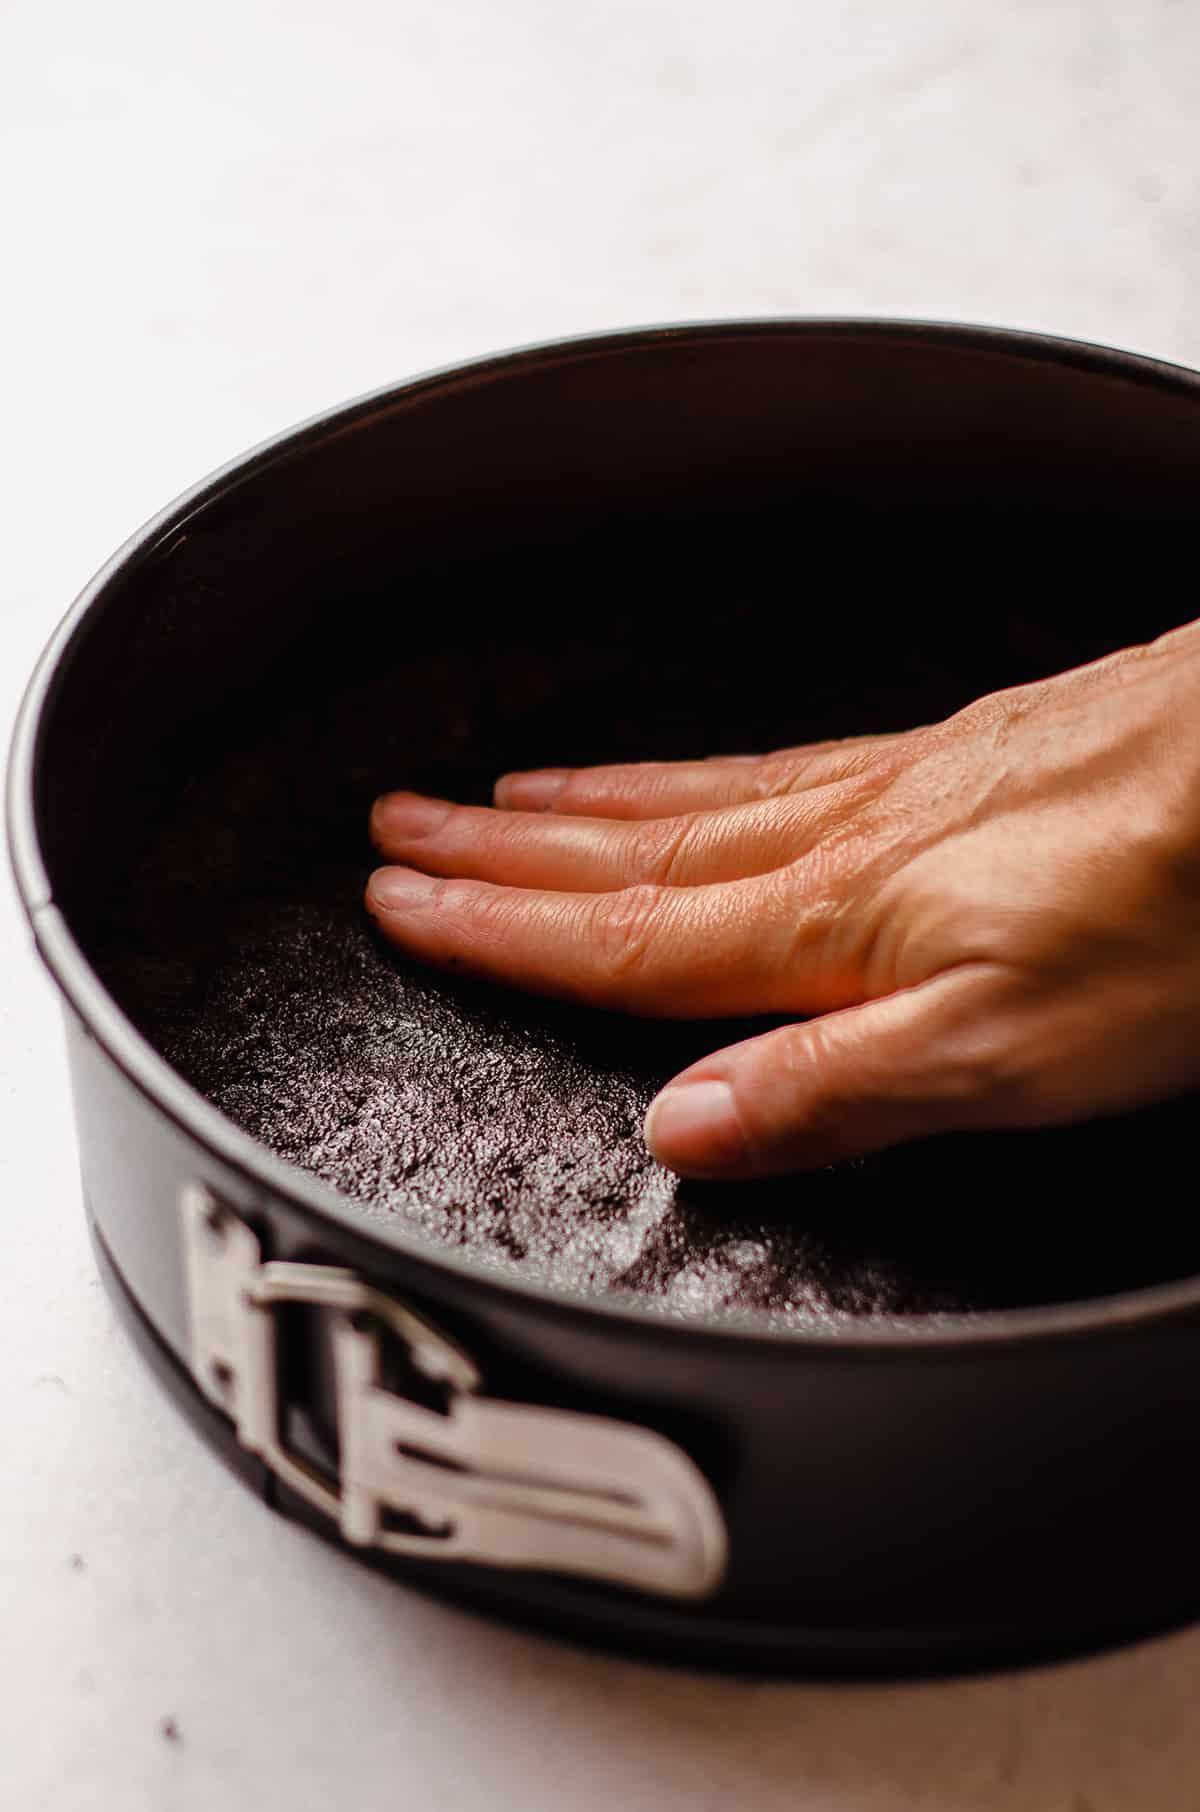 pressing oreo crust into a springform pan